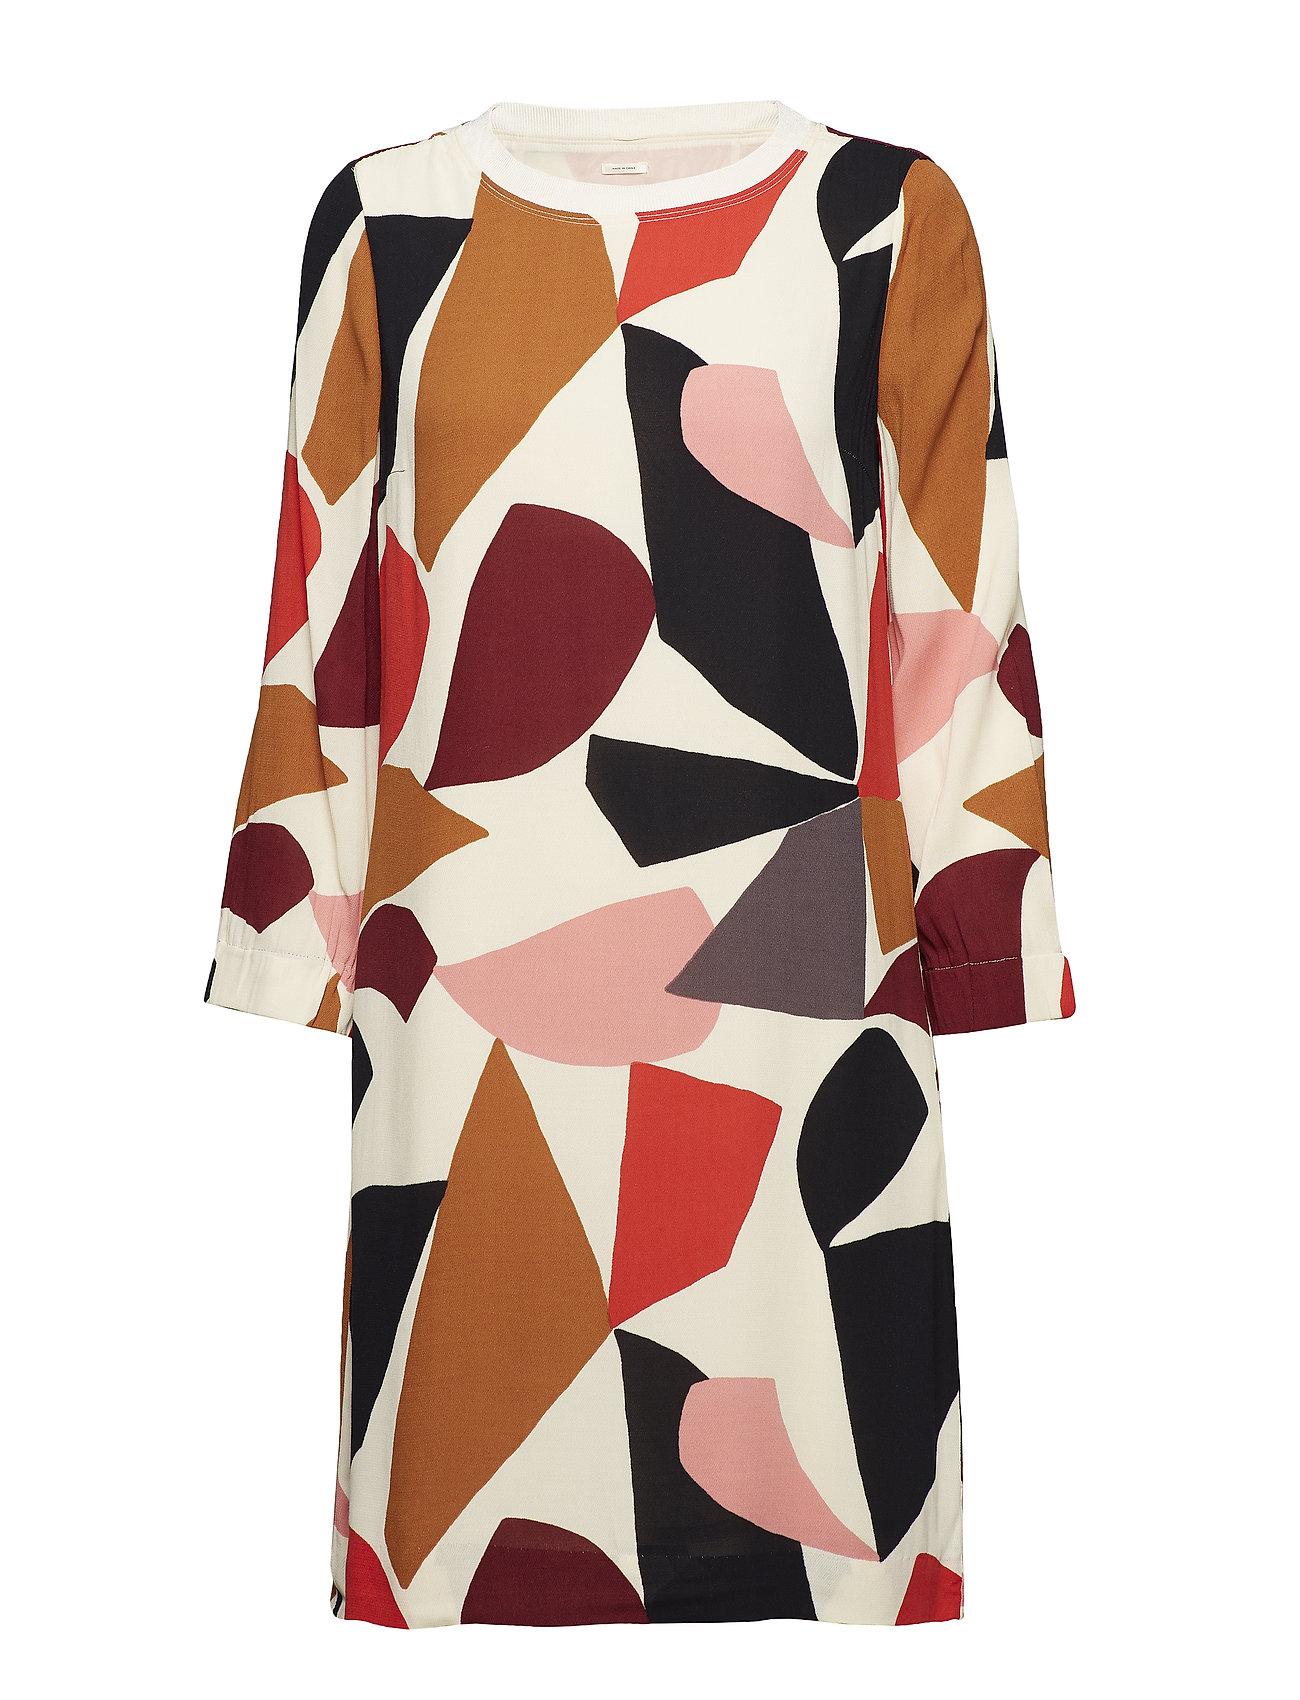 Image of Vexi Short Dress Lw Knælang Kjole Multi/mønstret INWEAR (3072755589)